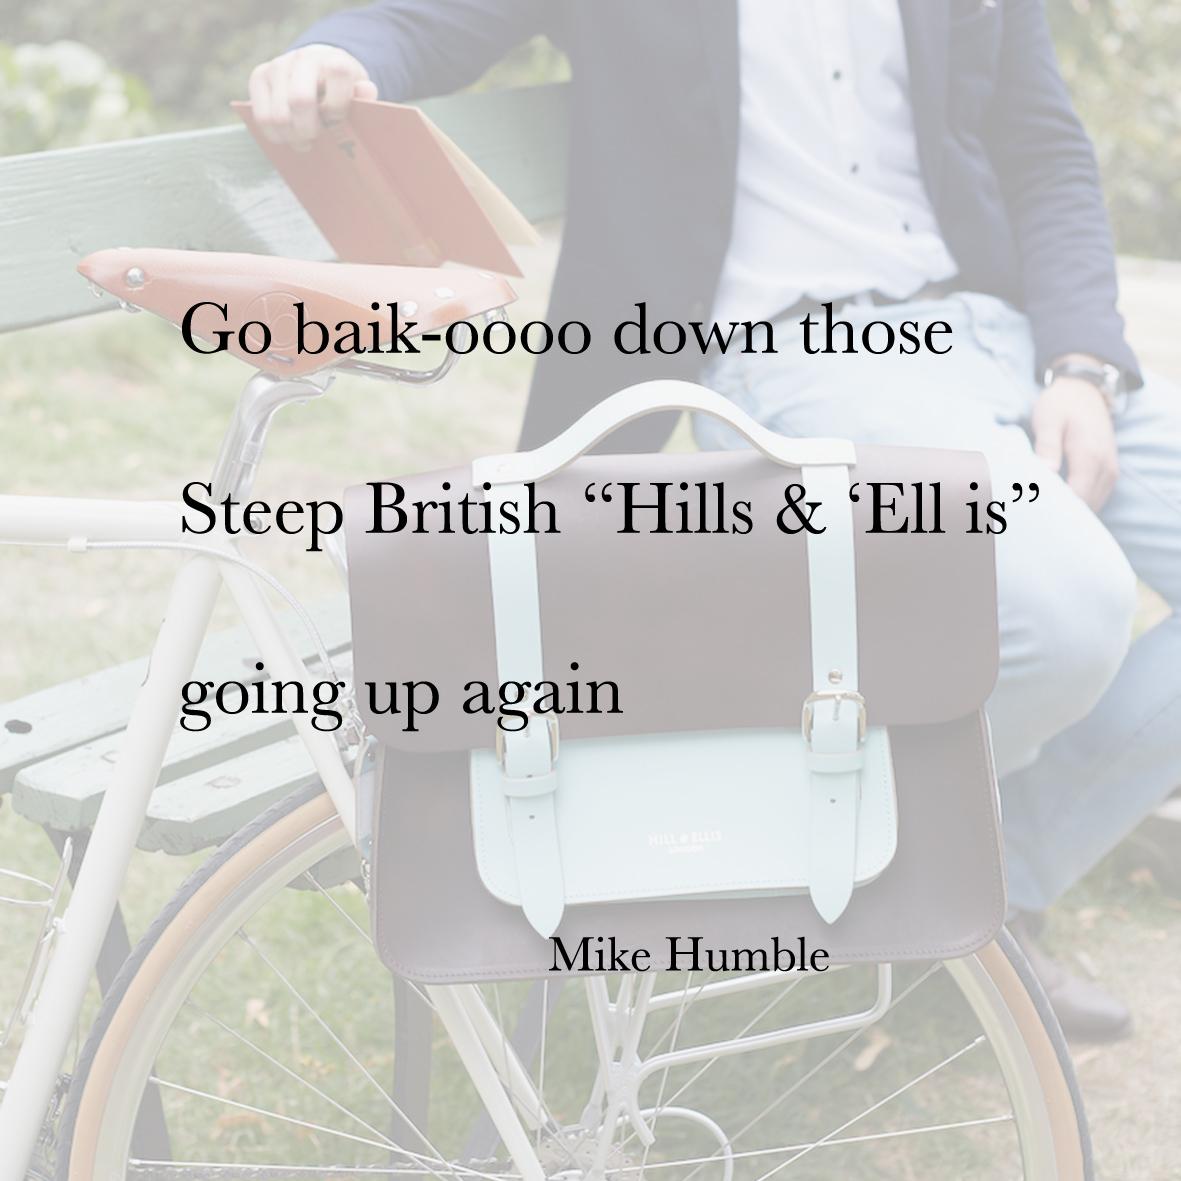 Baiku Mike Humble bike bag competition